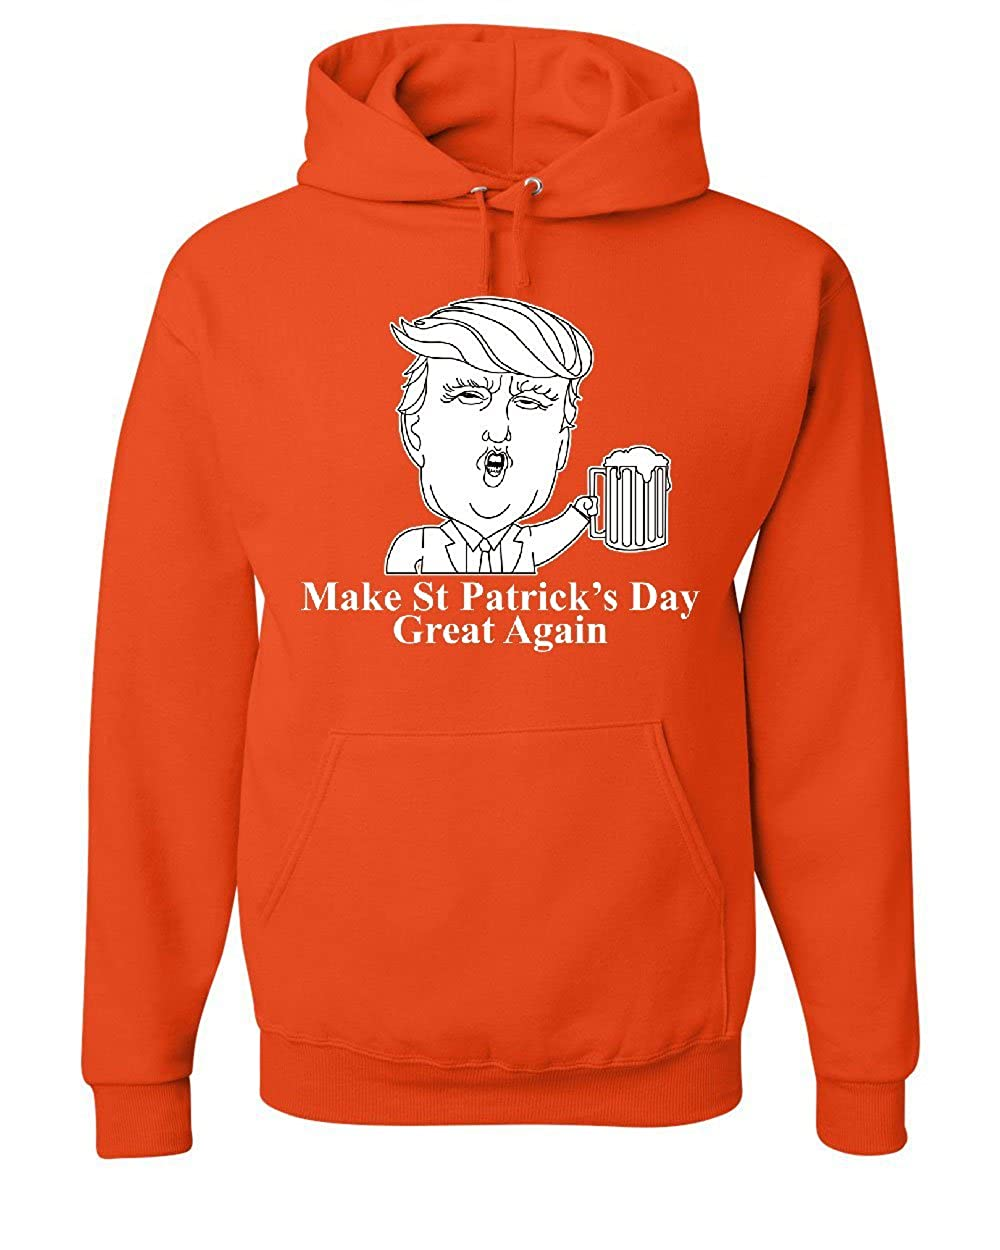 Patricks Day Great Again Hoodie Irish Trump MAGA Beer Sweatshirt Tee Hunt Make ST